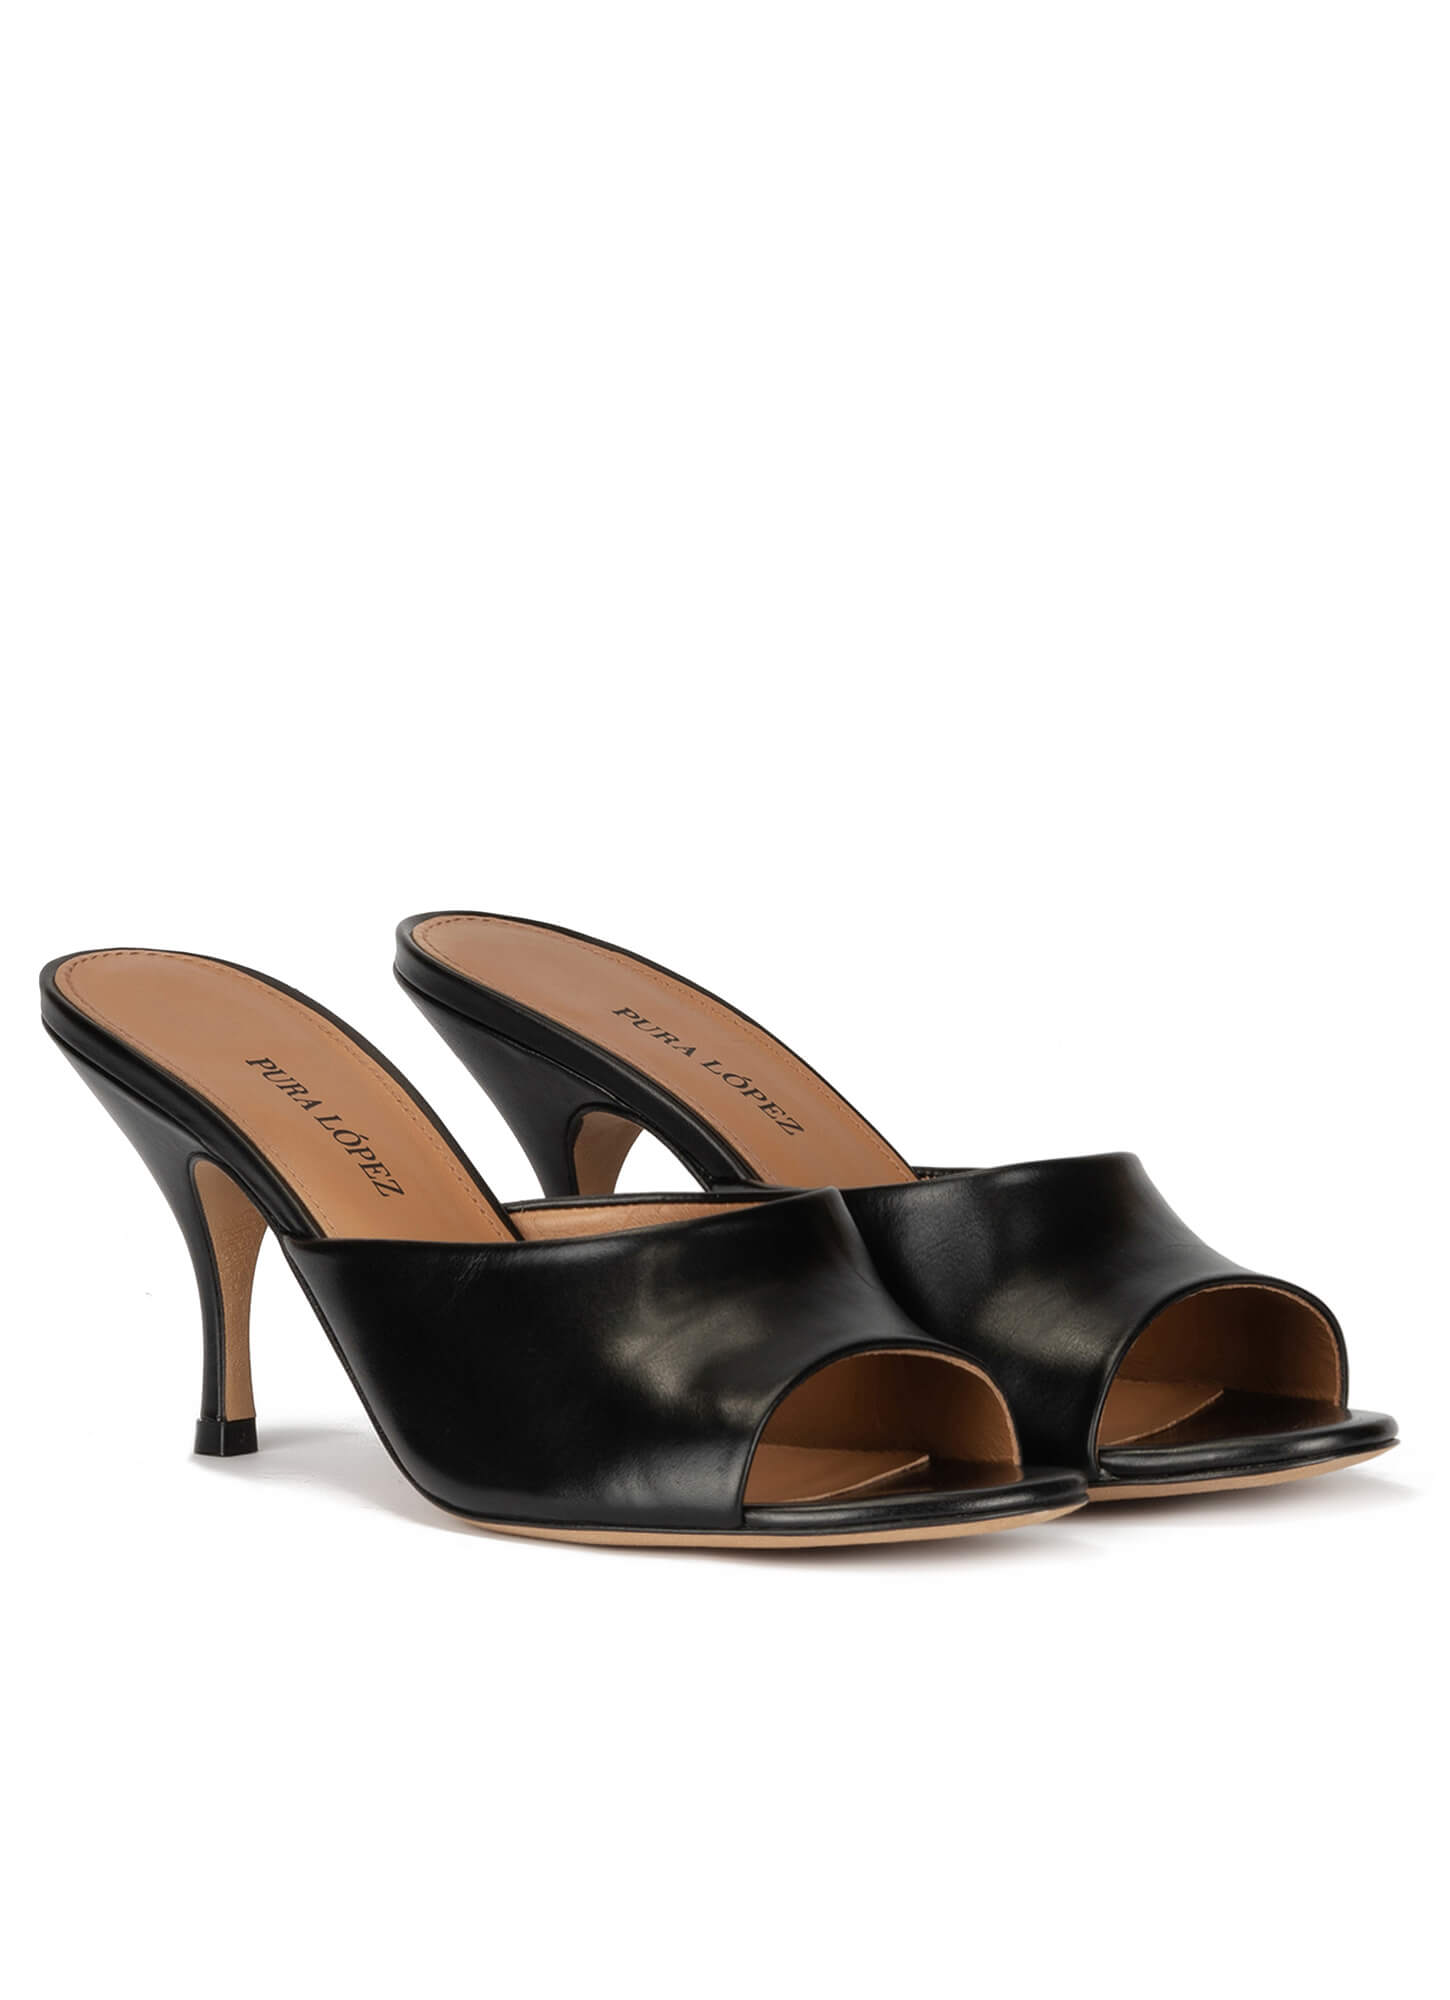 Mid heel mules in black leather . PURA